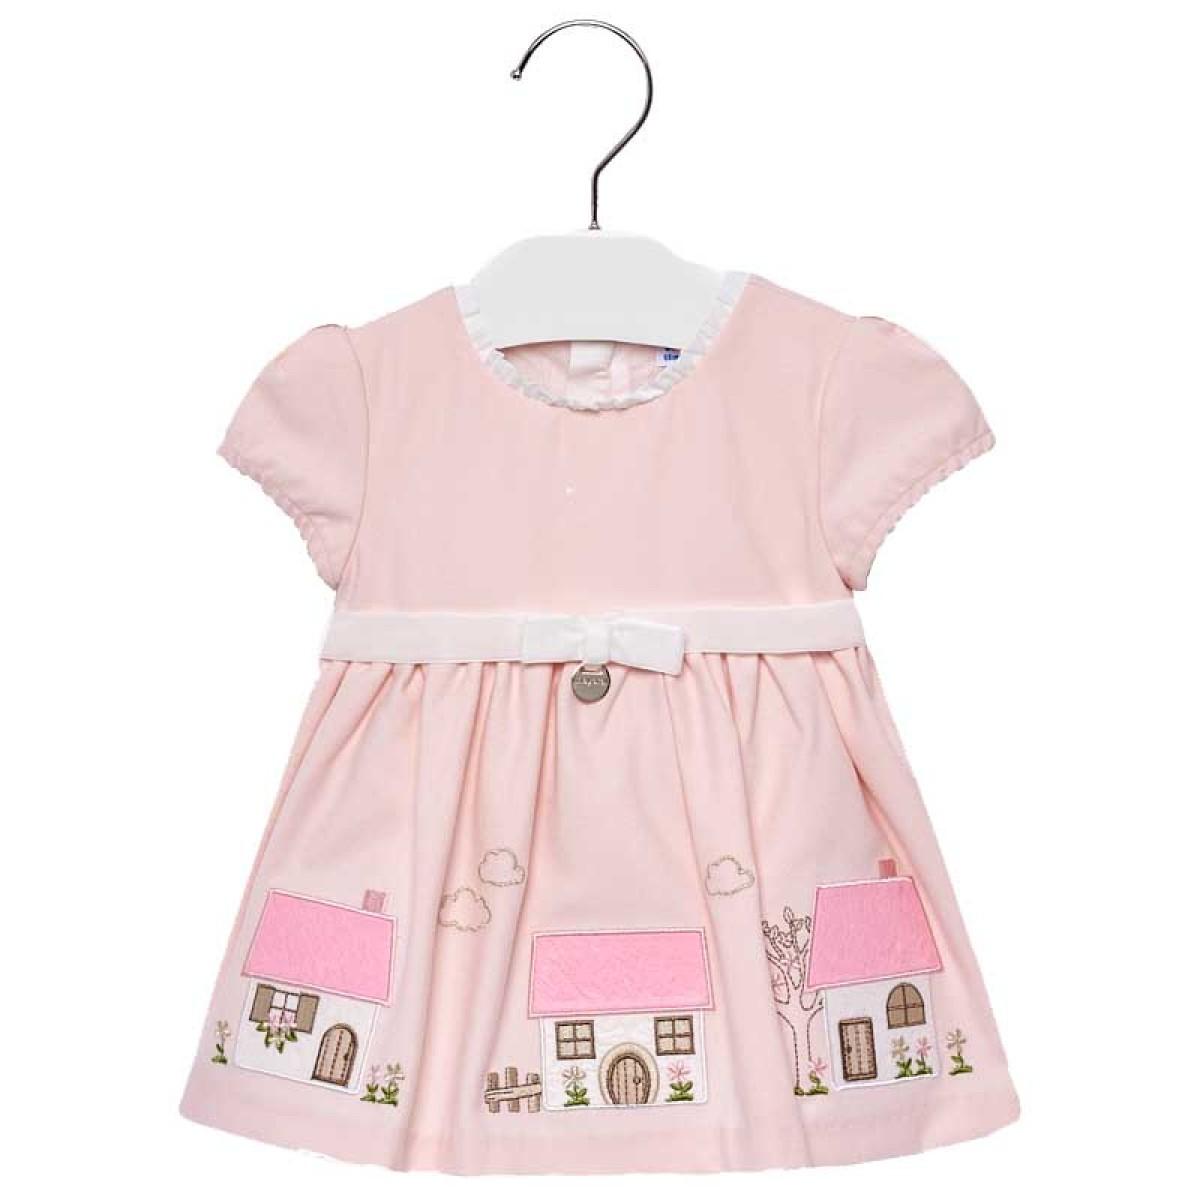 f51d0264557 -30% Φορεμα σπιτια κεντητα Mayoral 1802928 - ροζ Παιδικά